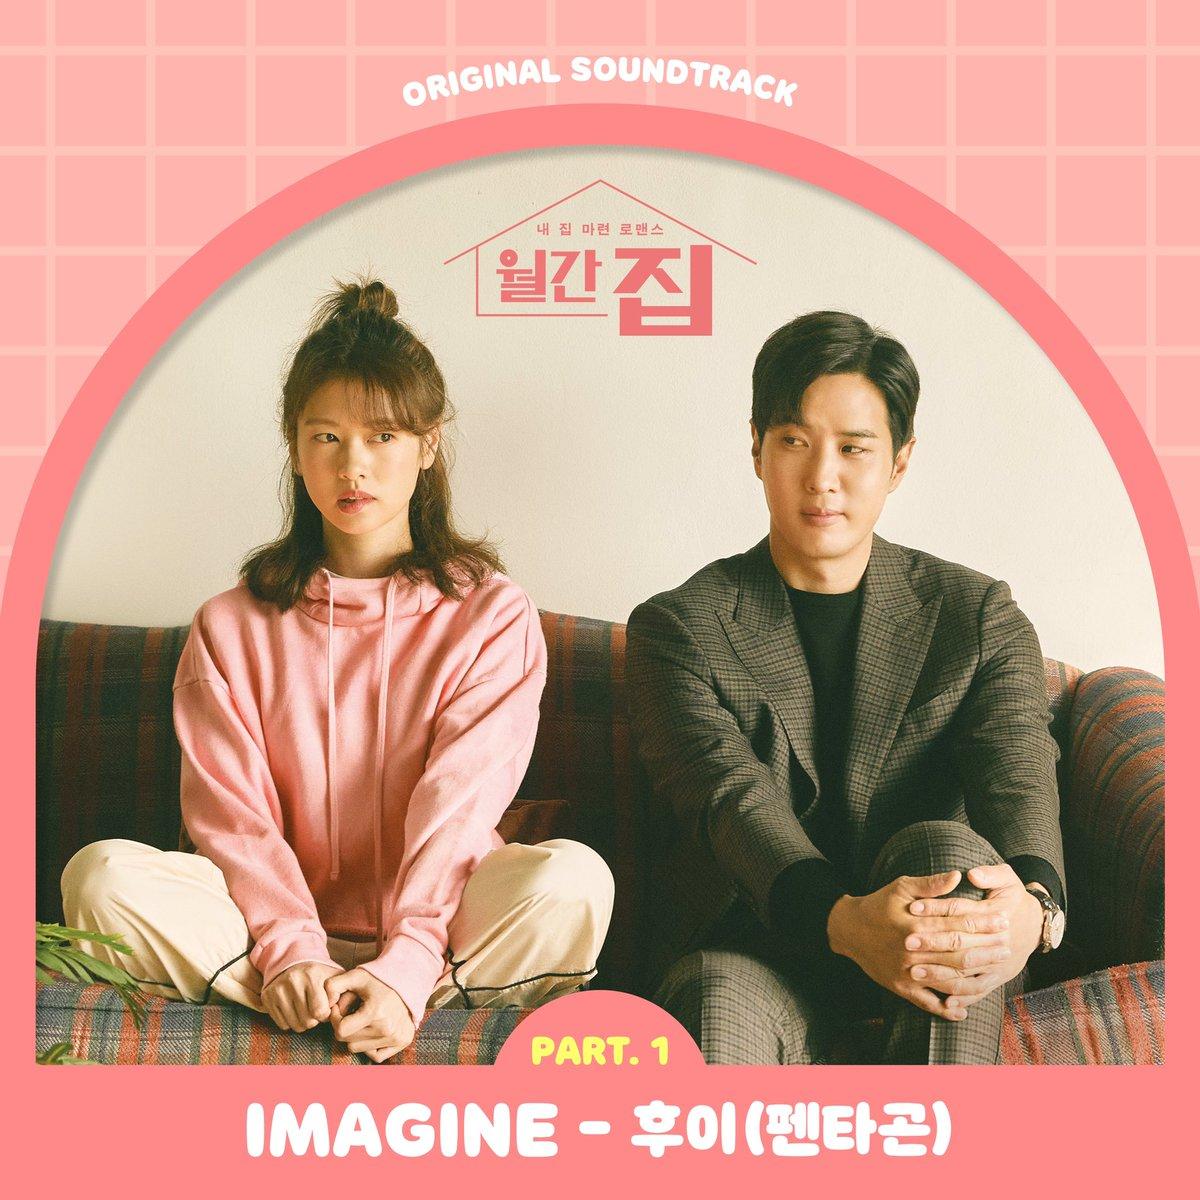 [新聞] PENTAGON HUI發行《月刊家》OST《Imagine》